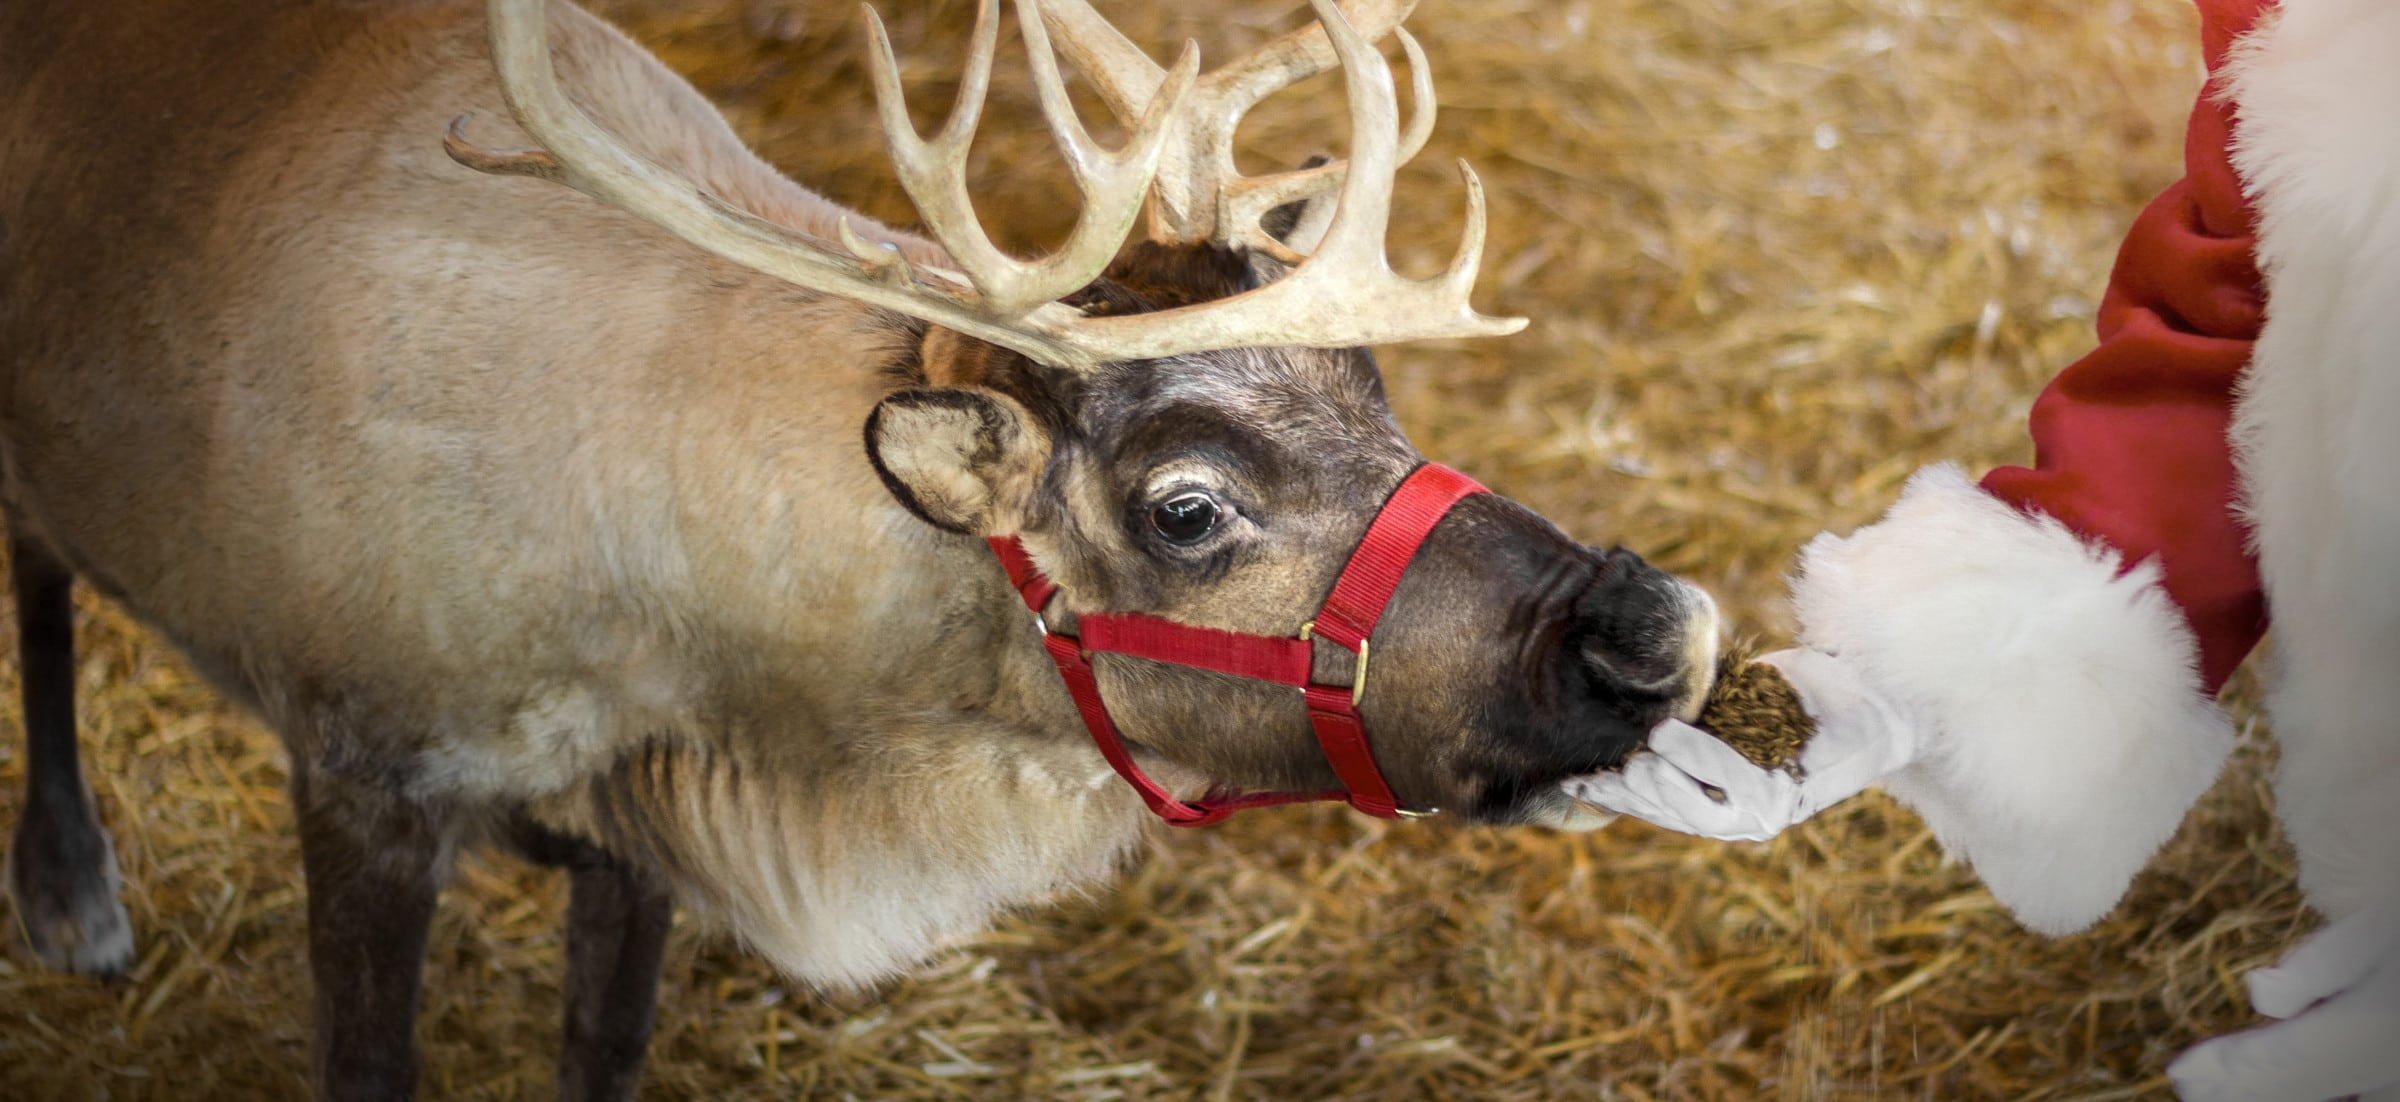 Christmas Candylane - Santa and Reindeer